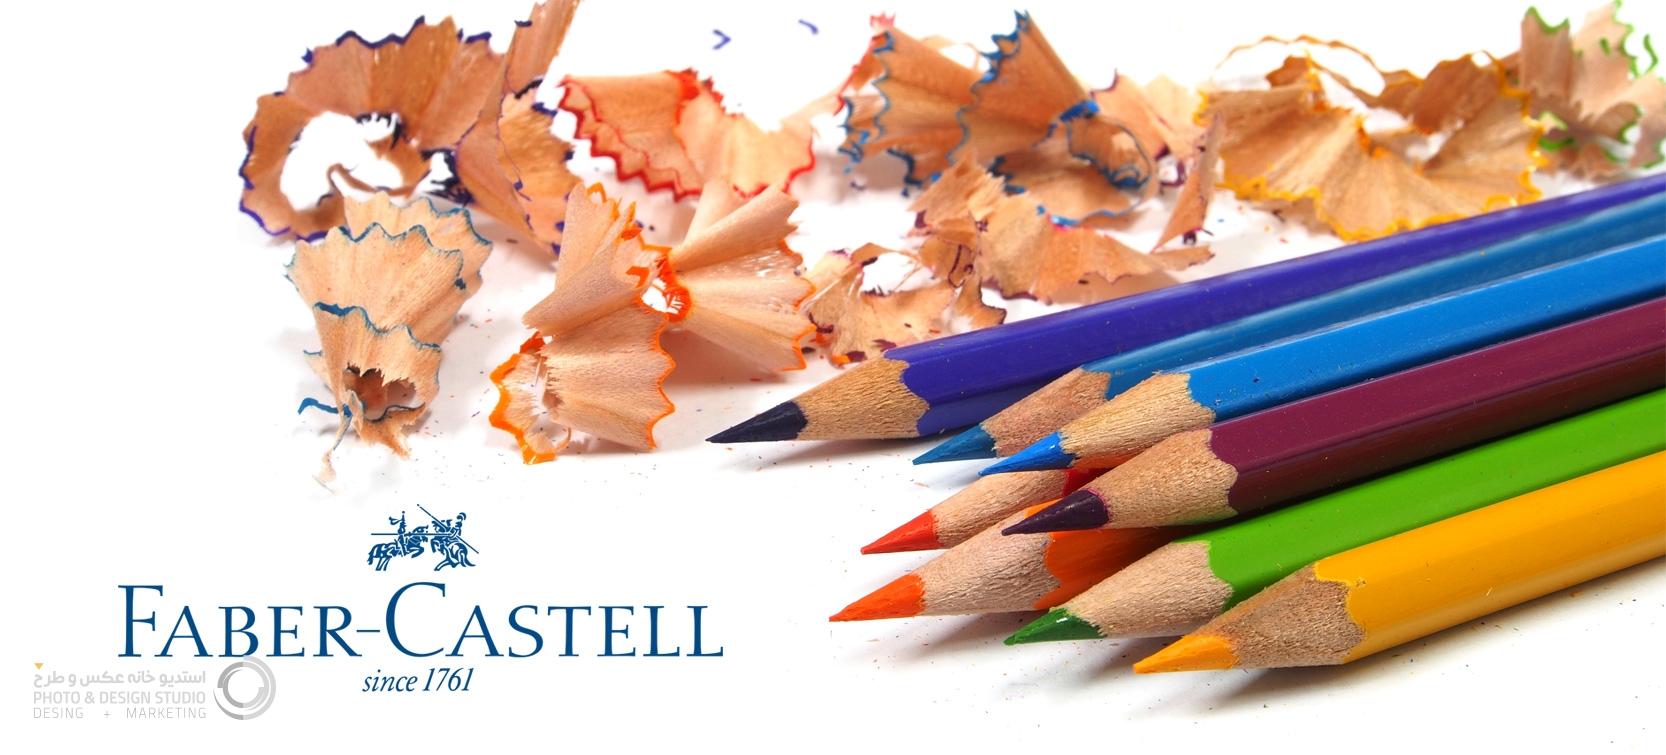 advertising photography, create, imaginary, Image design, building photo, photographer, production, art